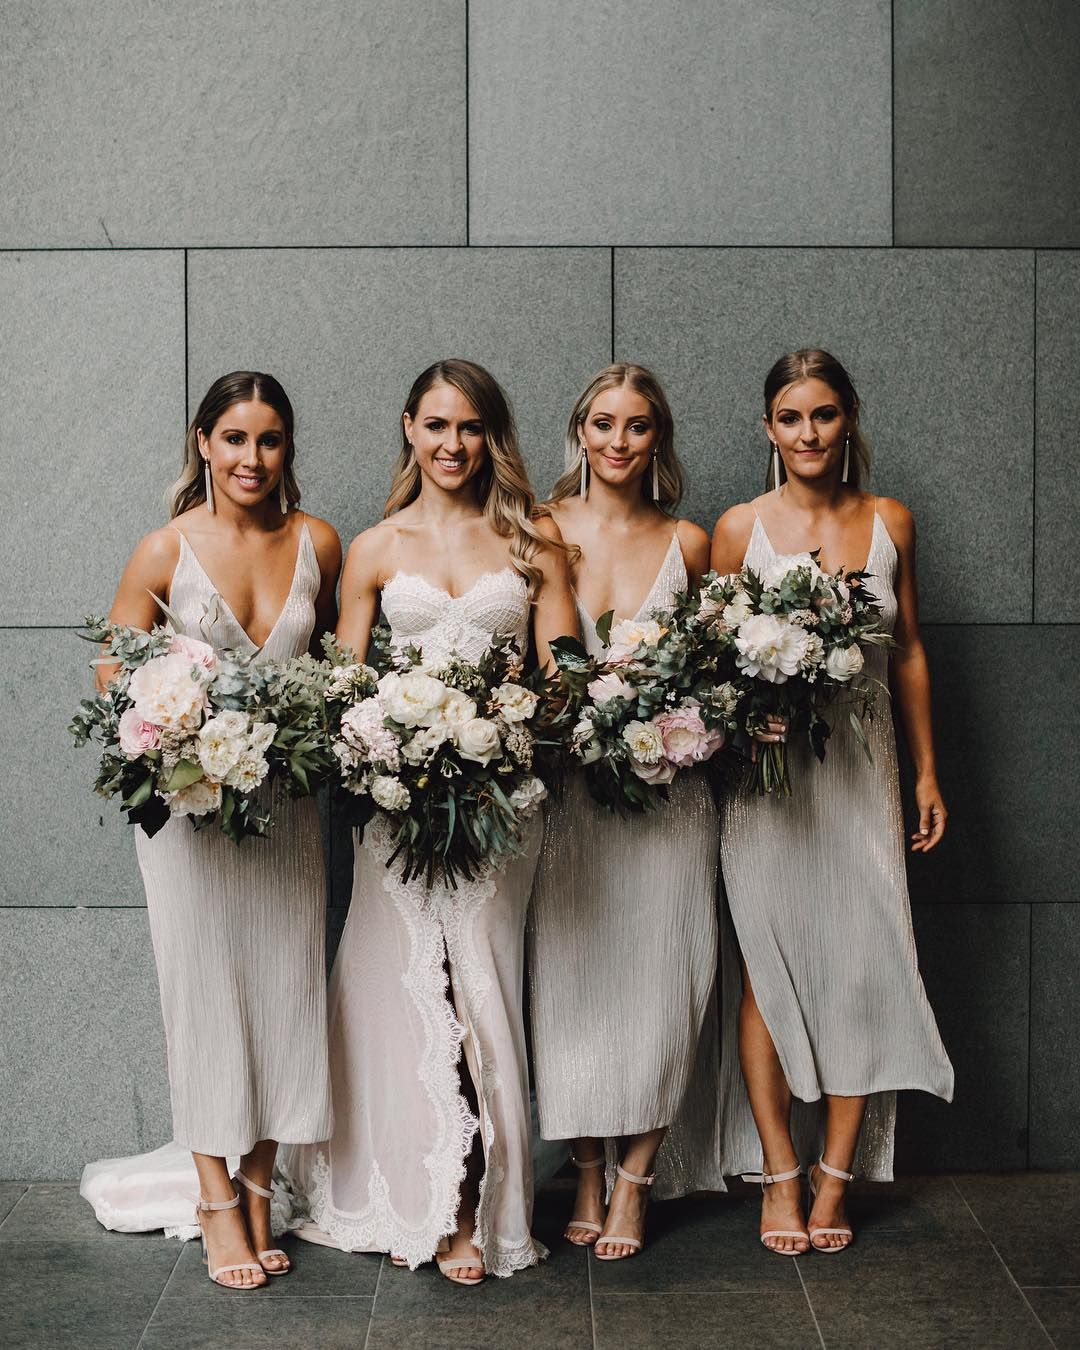 Wedding Dresses 2019 Near Me: Botanical Bridal Bouquet, Grey Natalie Rolt Bridesmaid